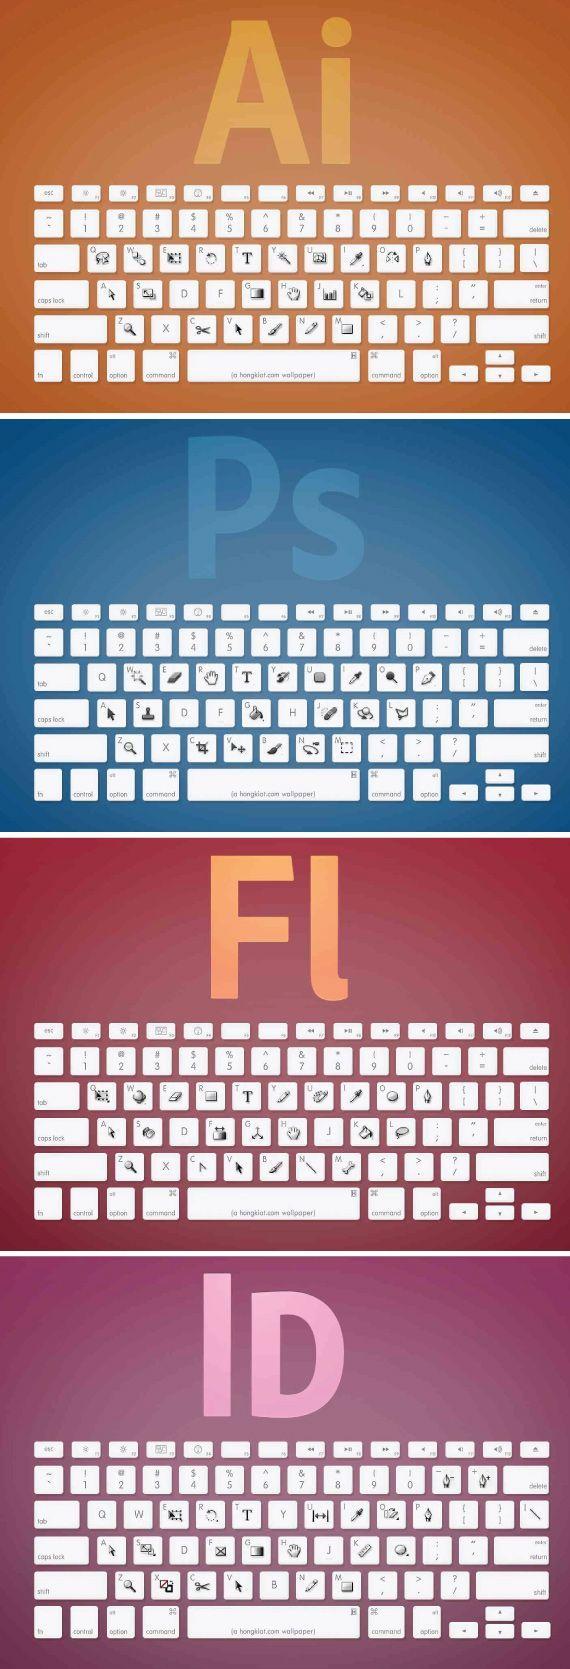 useful  -- adobe keyboard shortcuts guide